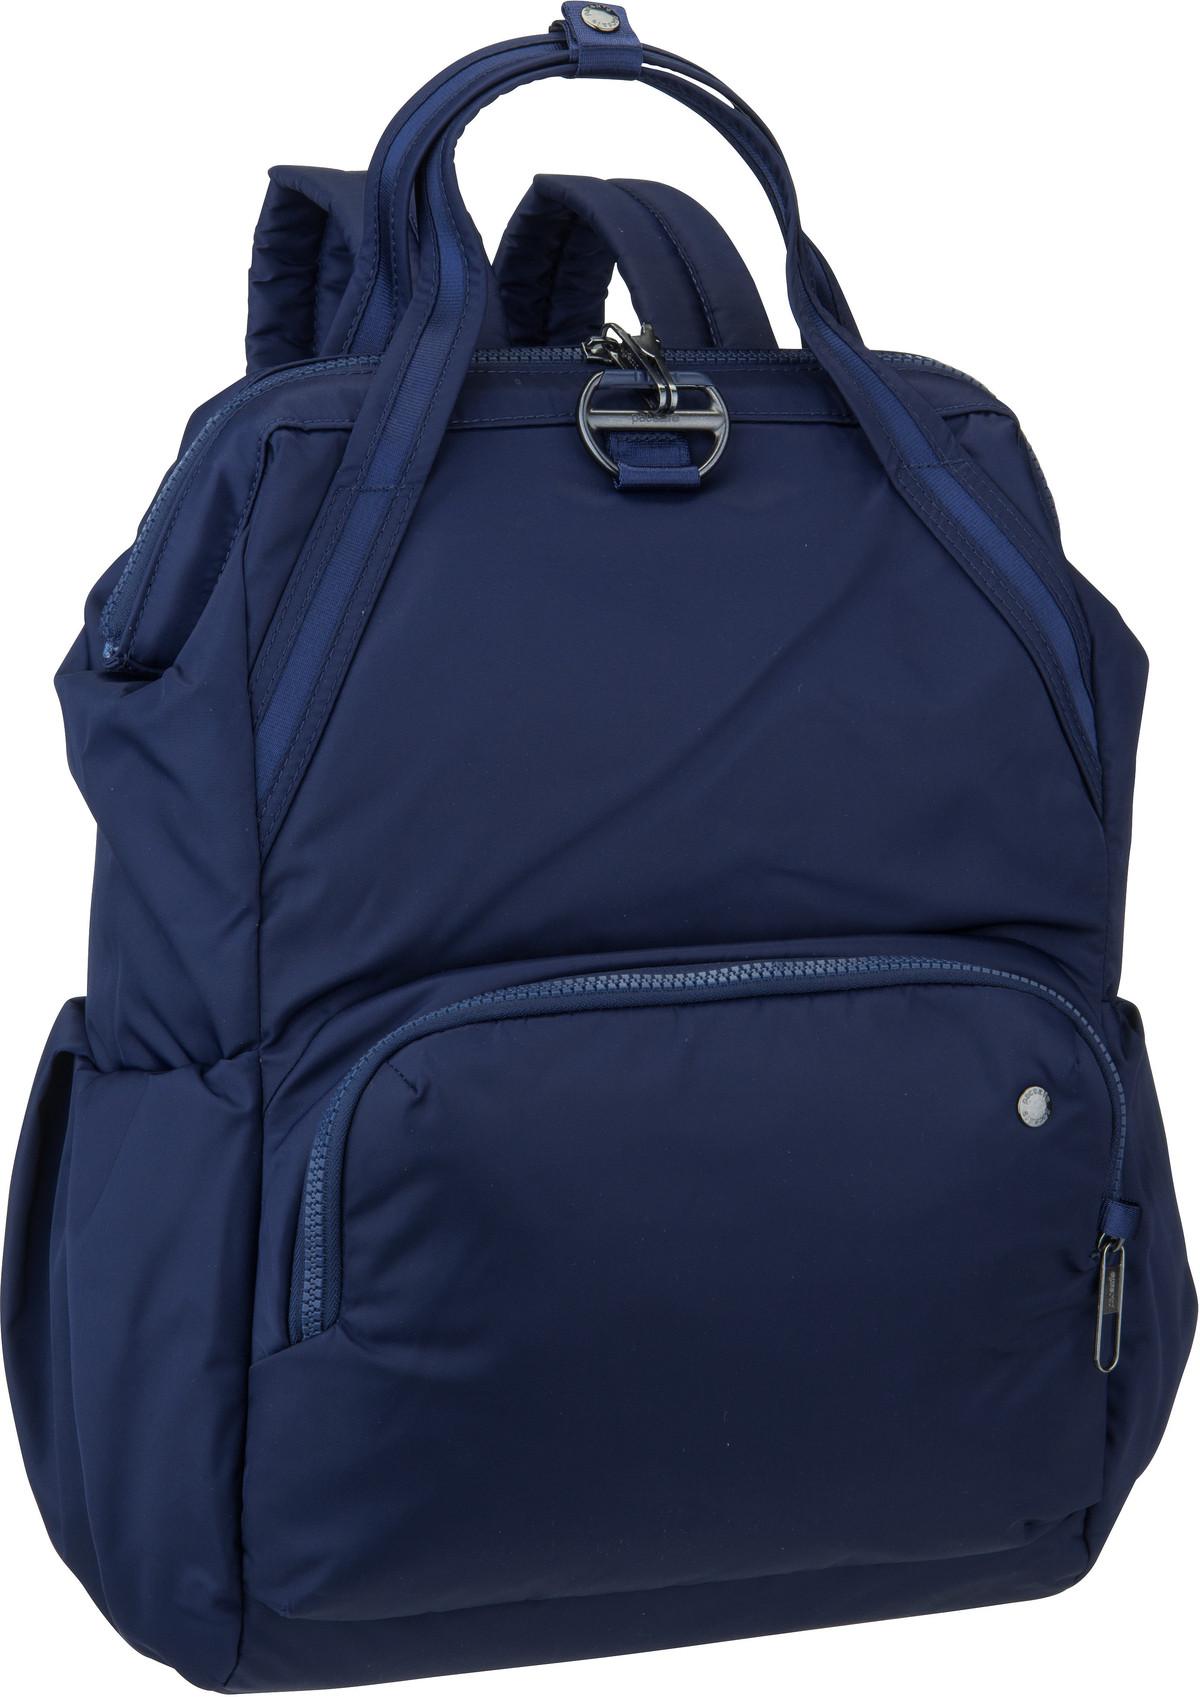 Laptoprucksack Citysafe CX Backpack Nightfall (17 Liter)